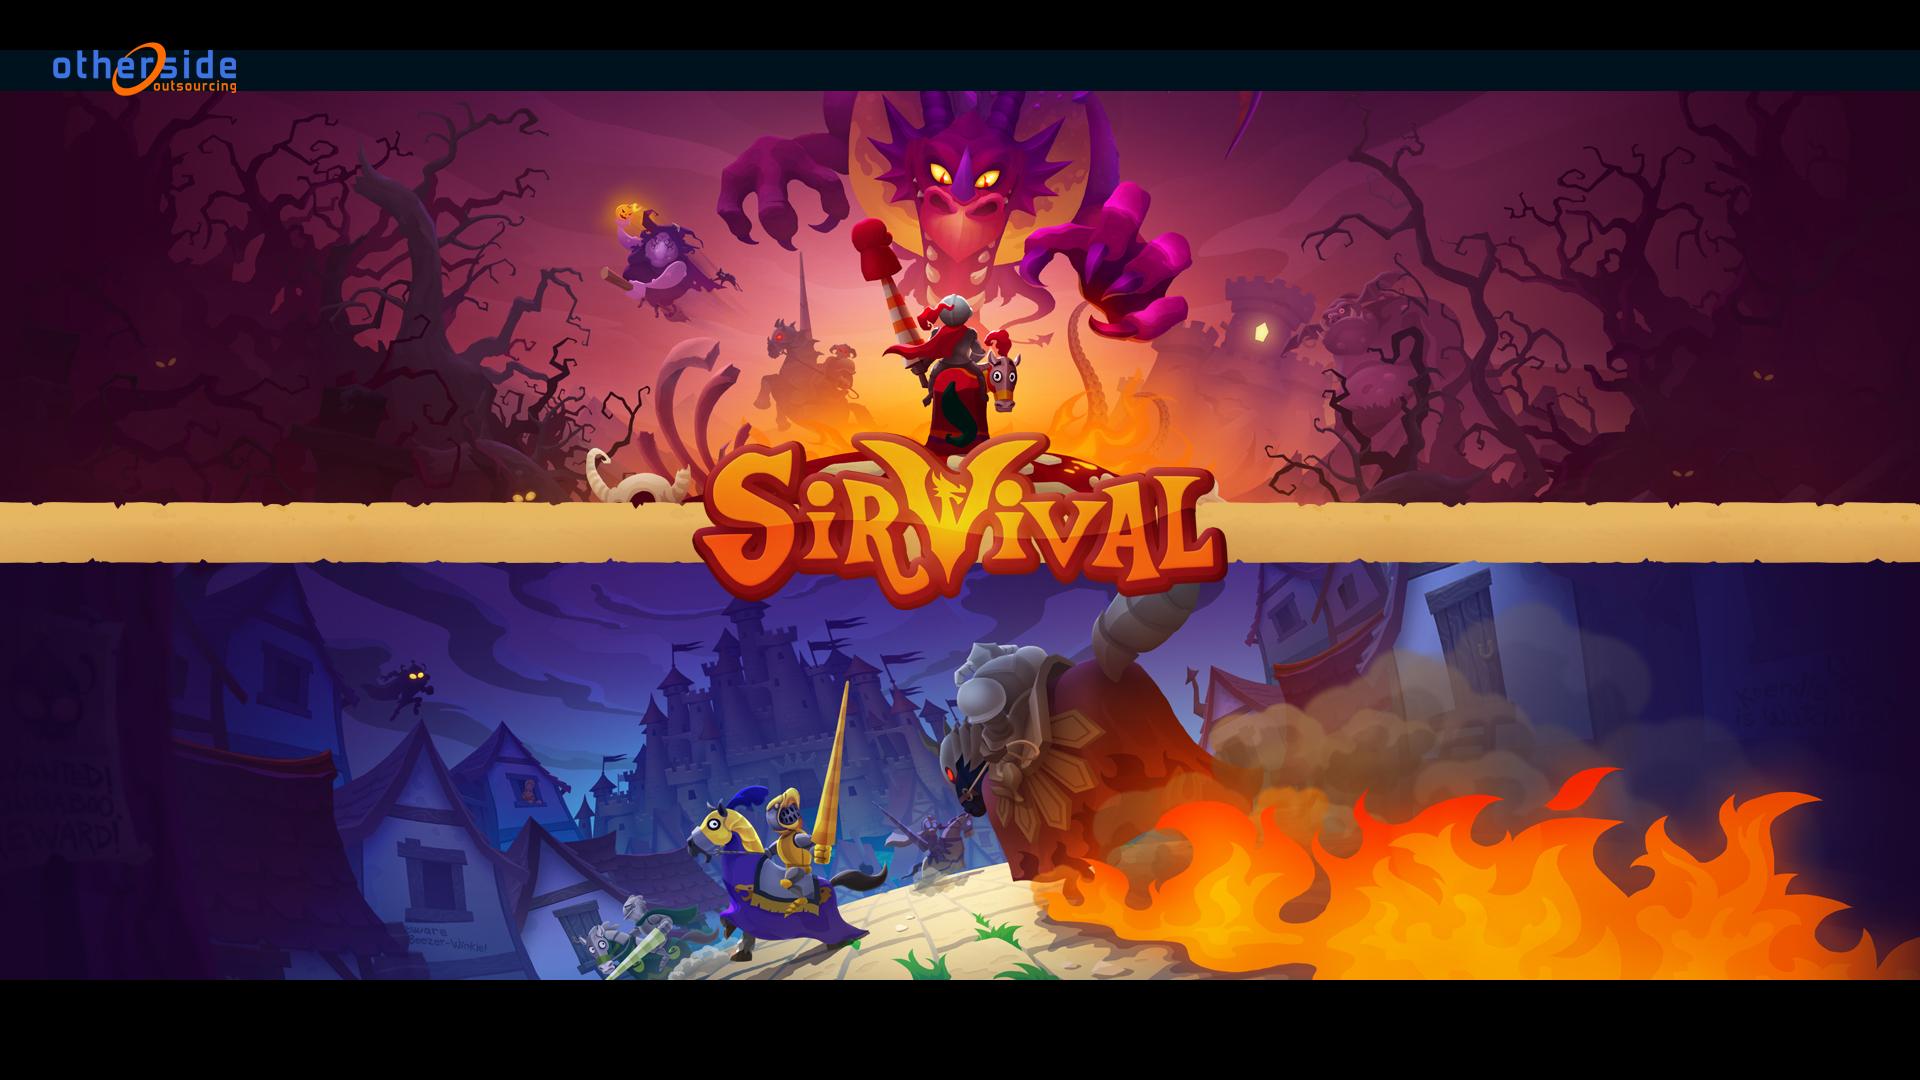 SirVival